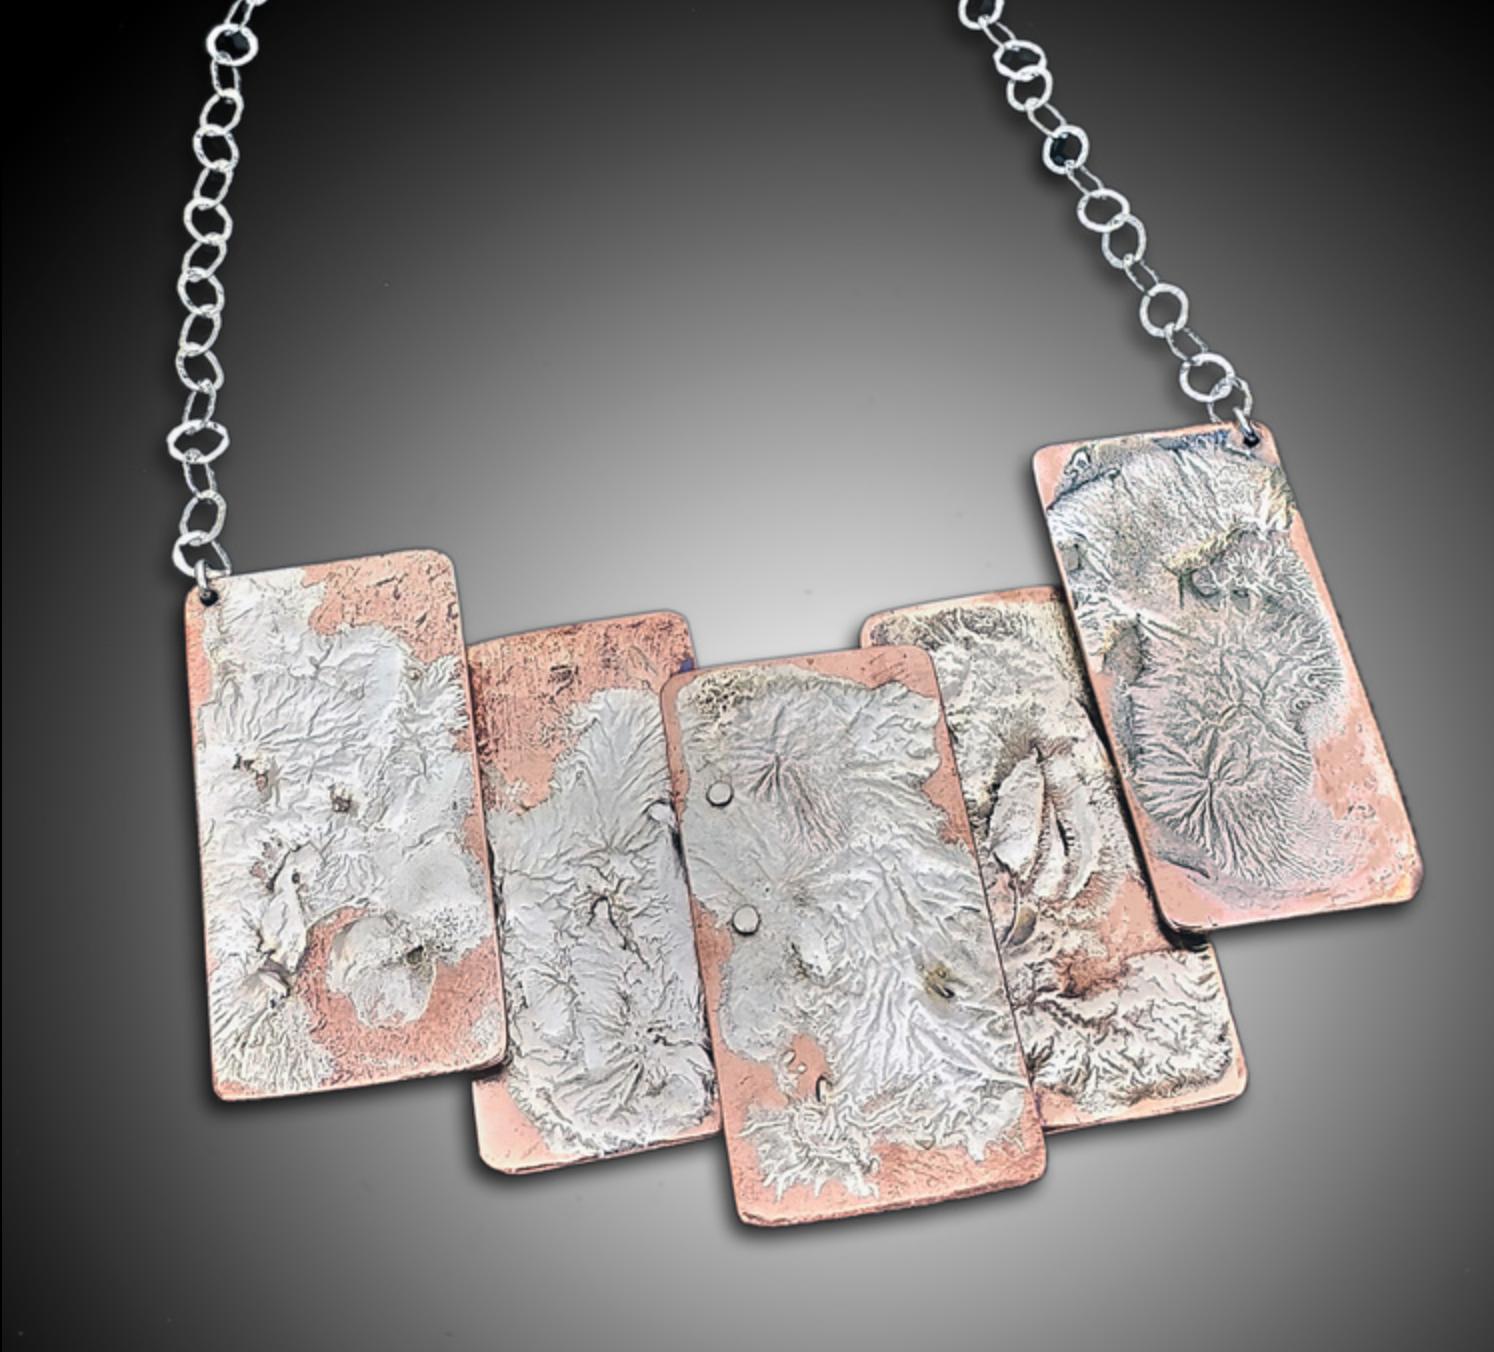 Jewelry- Danny Bushart